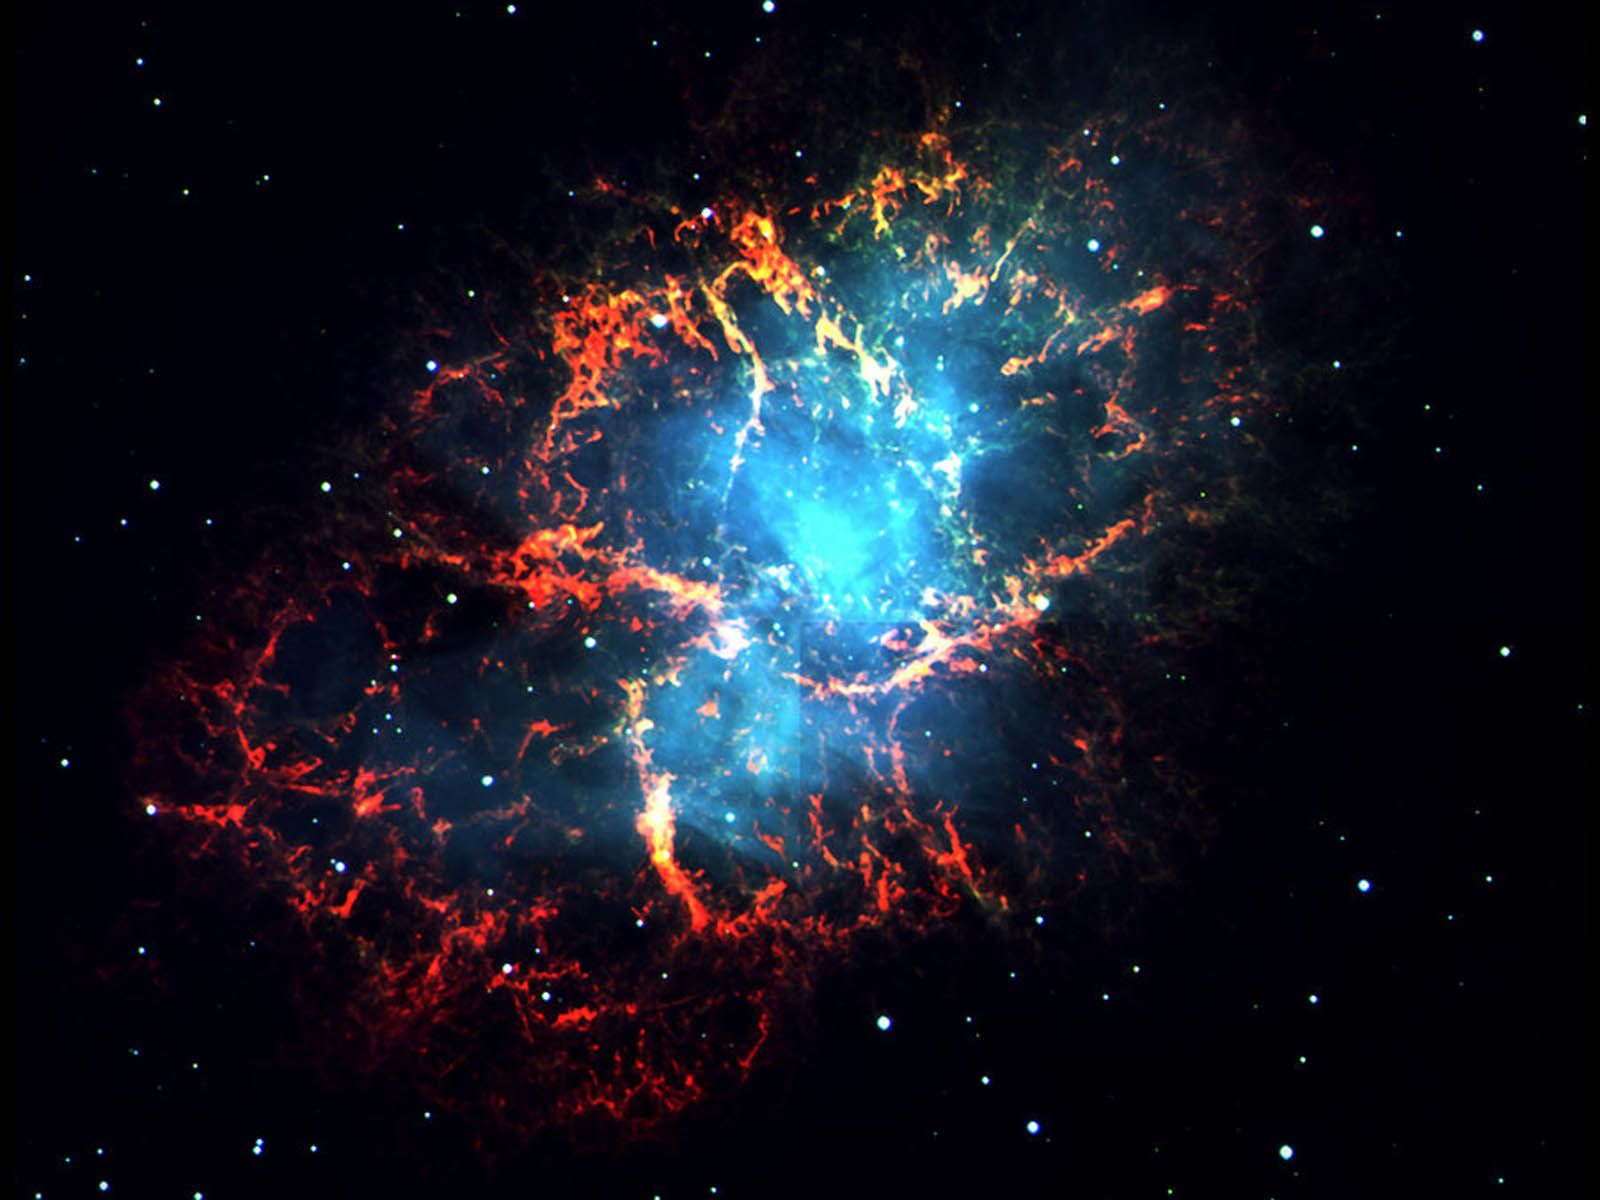 Outer Space Nebula Wallpaper Hd